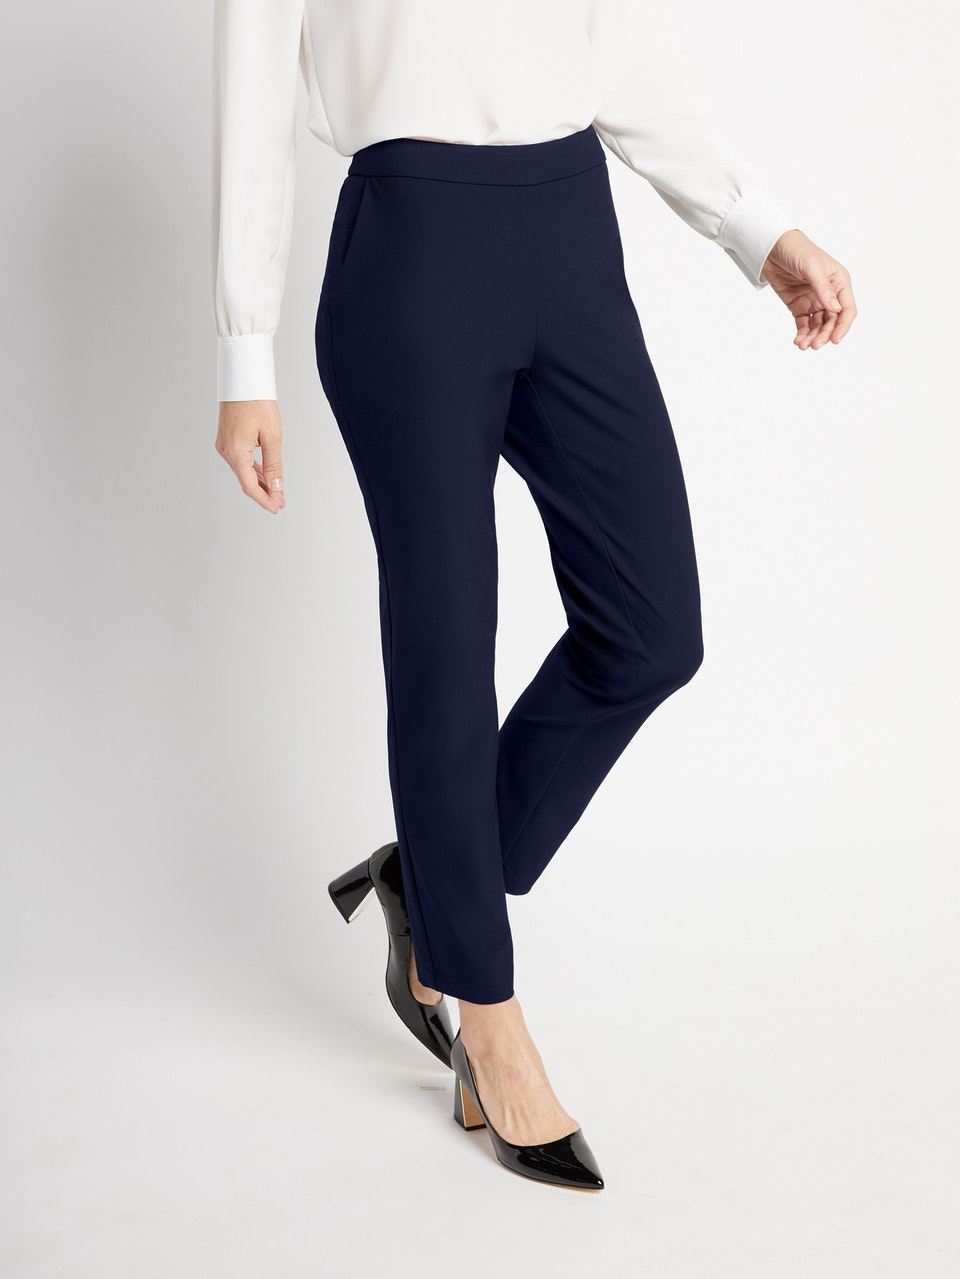 Hanover Pants